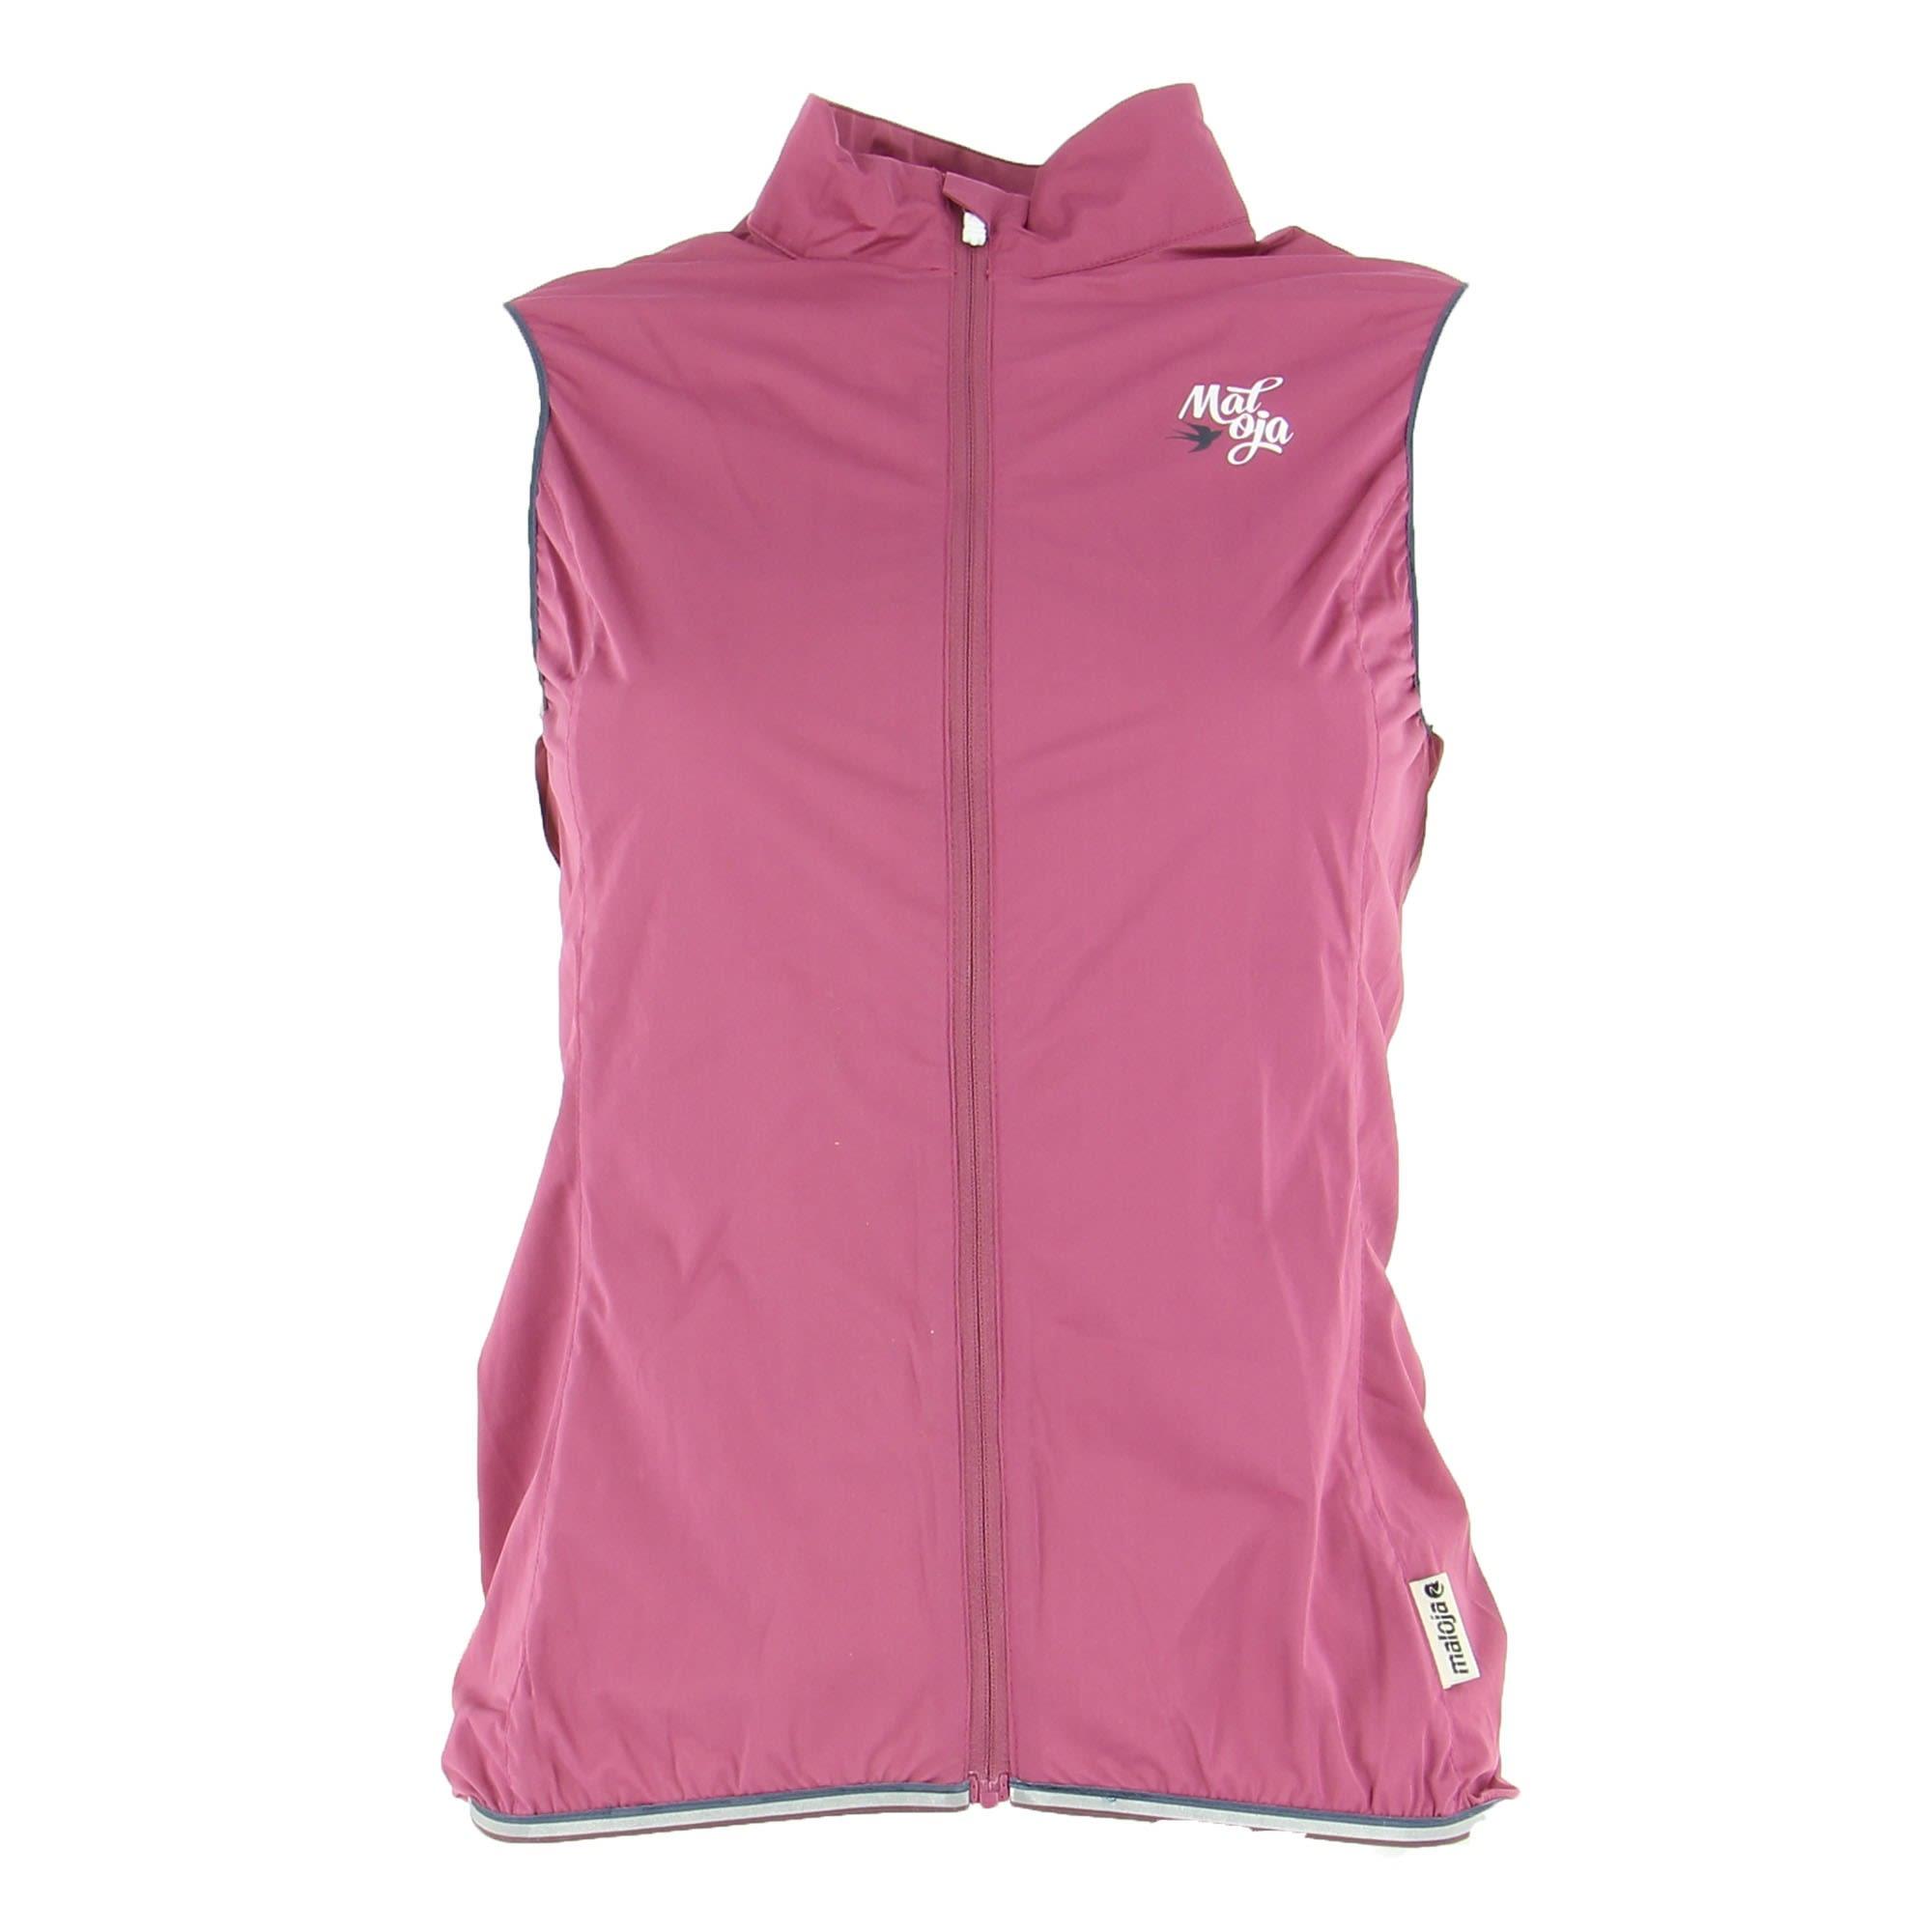 Maloja Poppym. Vest Pink, Female Winddichte Weste, S